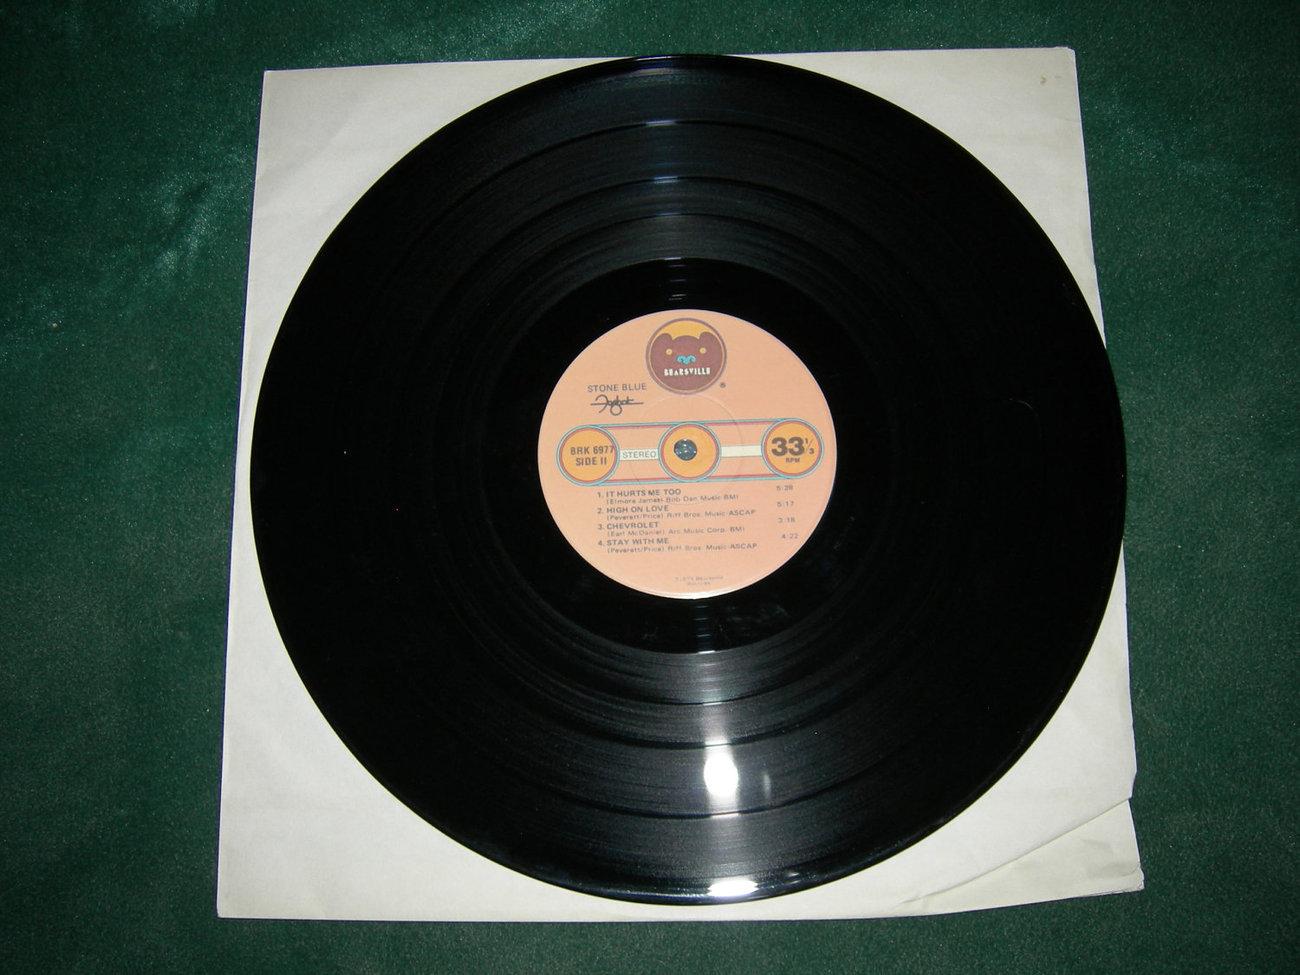 Foghat - Stone Blue - 1978 LP